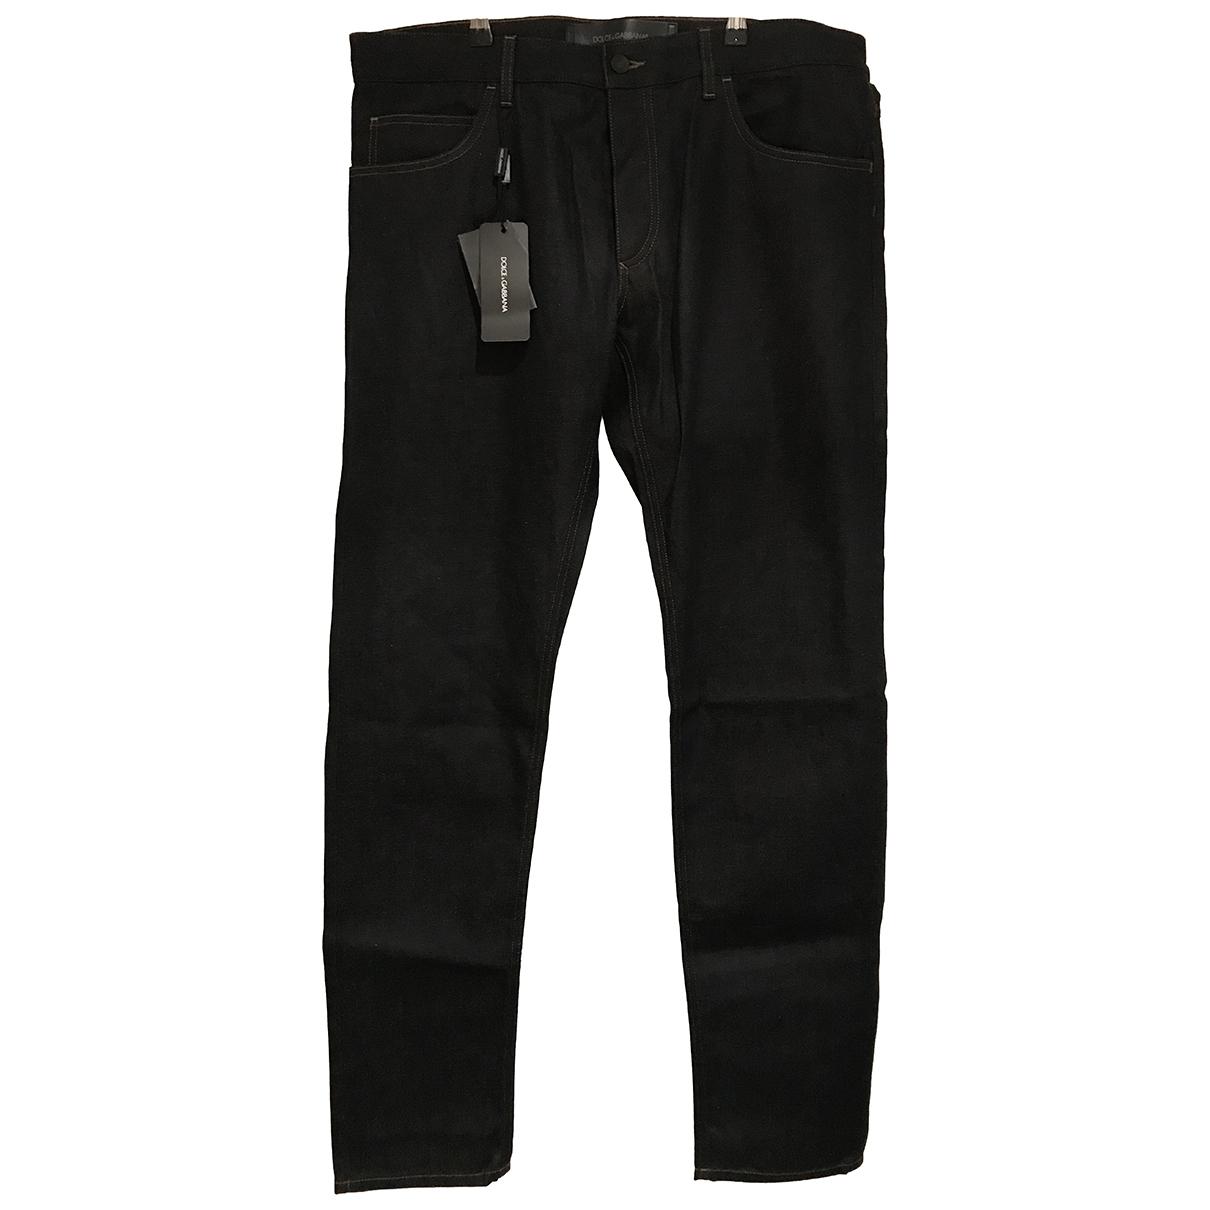 Dolce & Gabbana \N Navy Cotton Jeans for Men 36 US